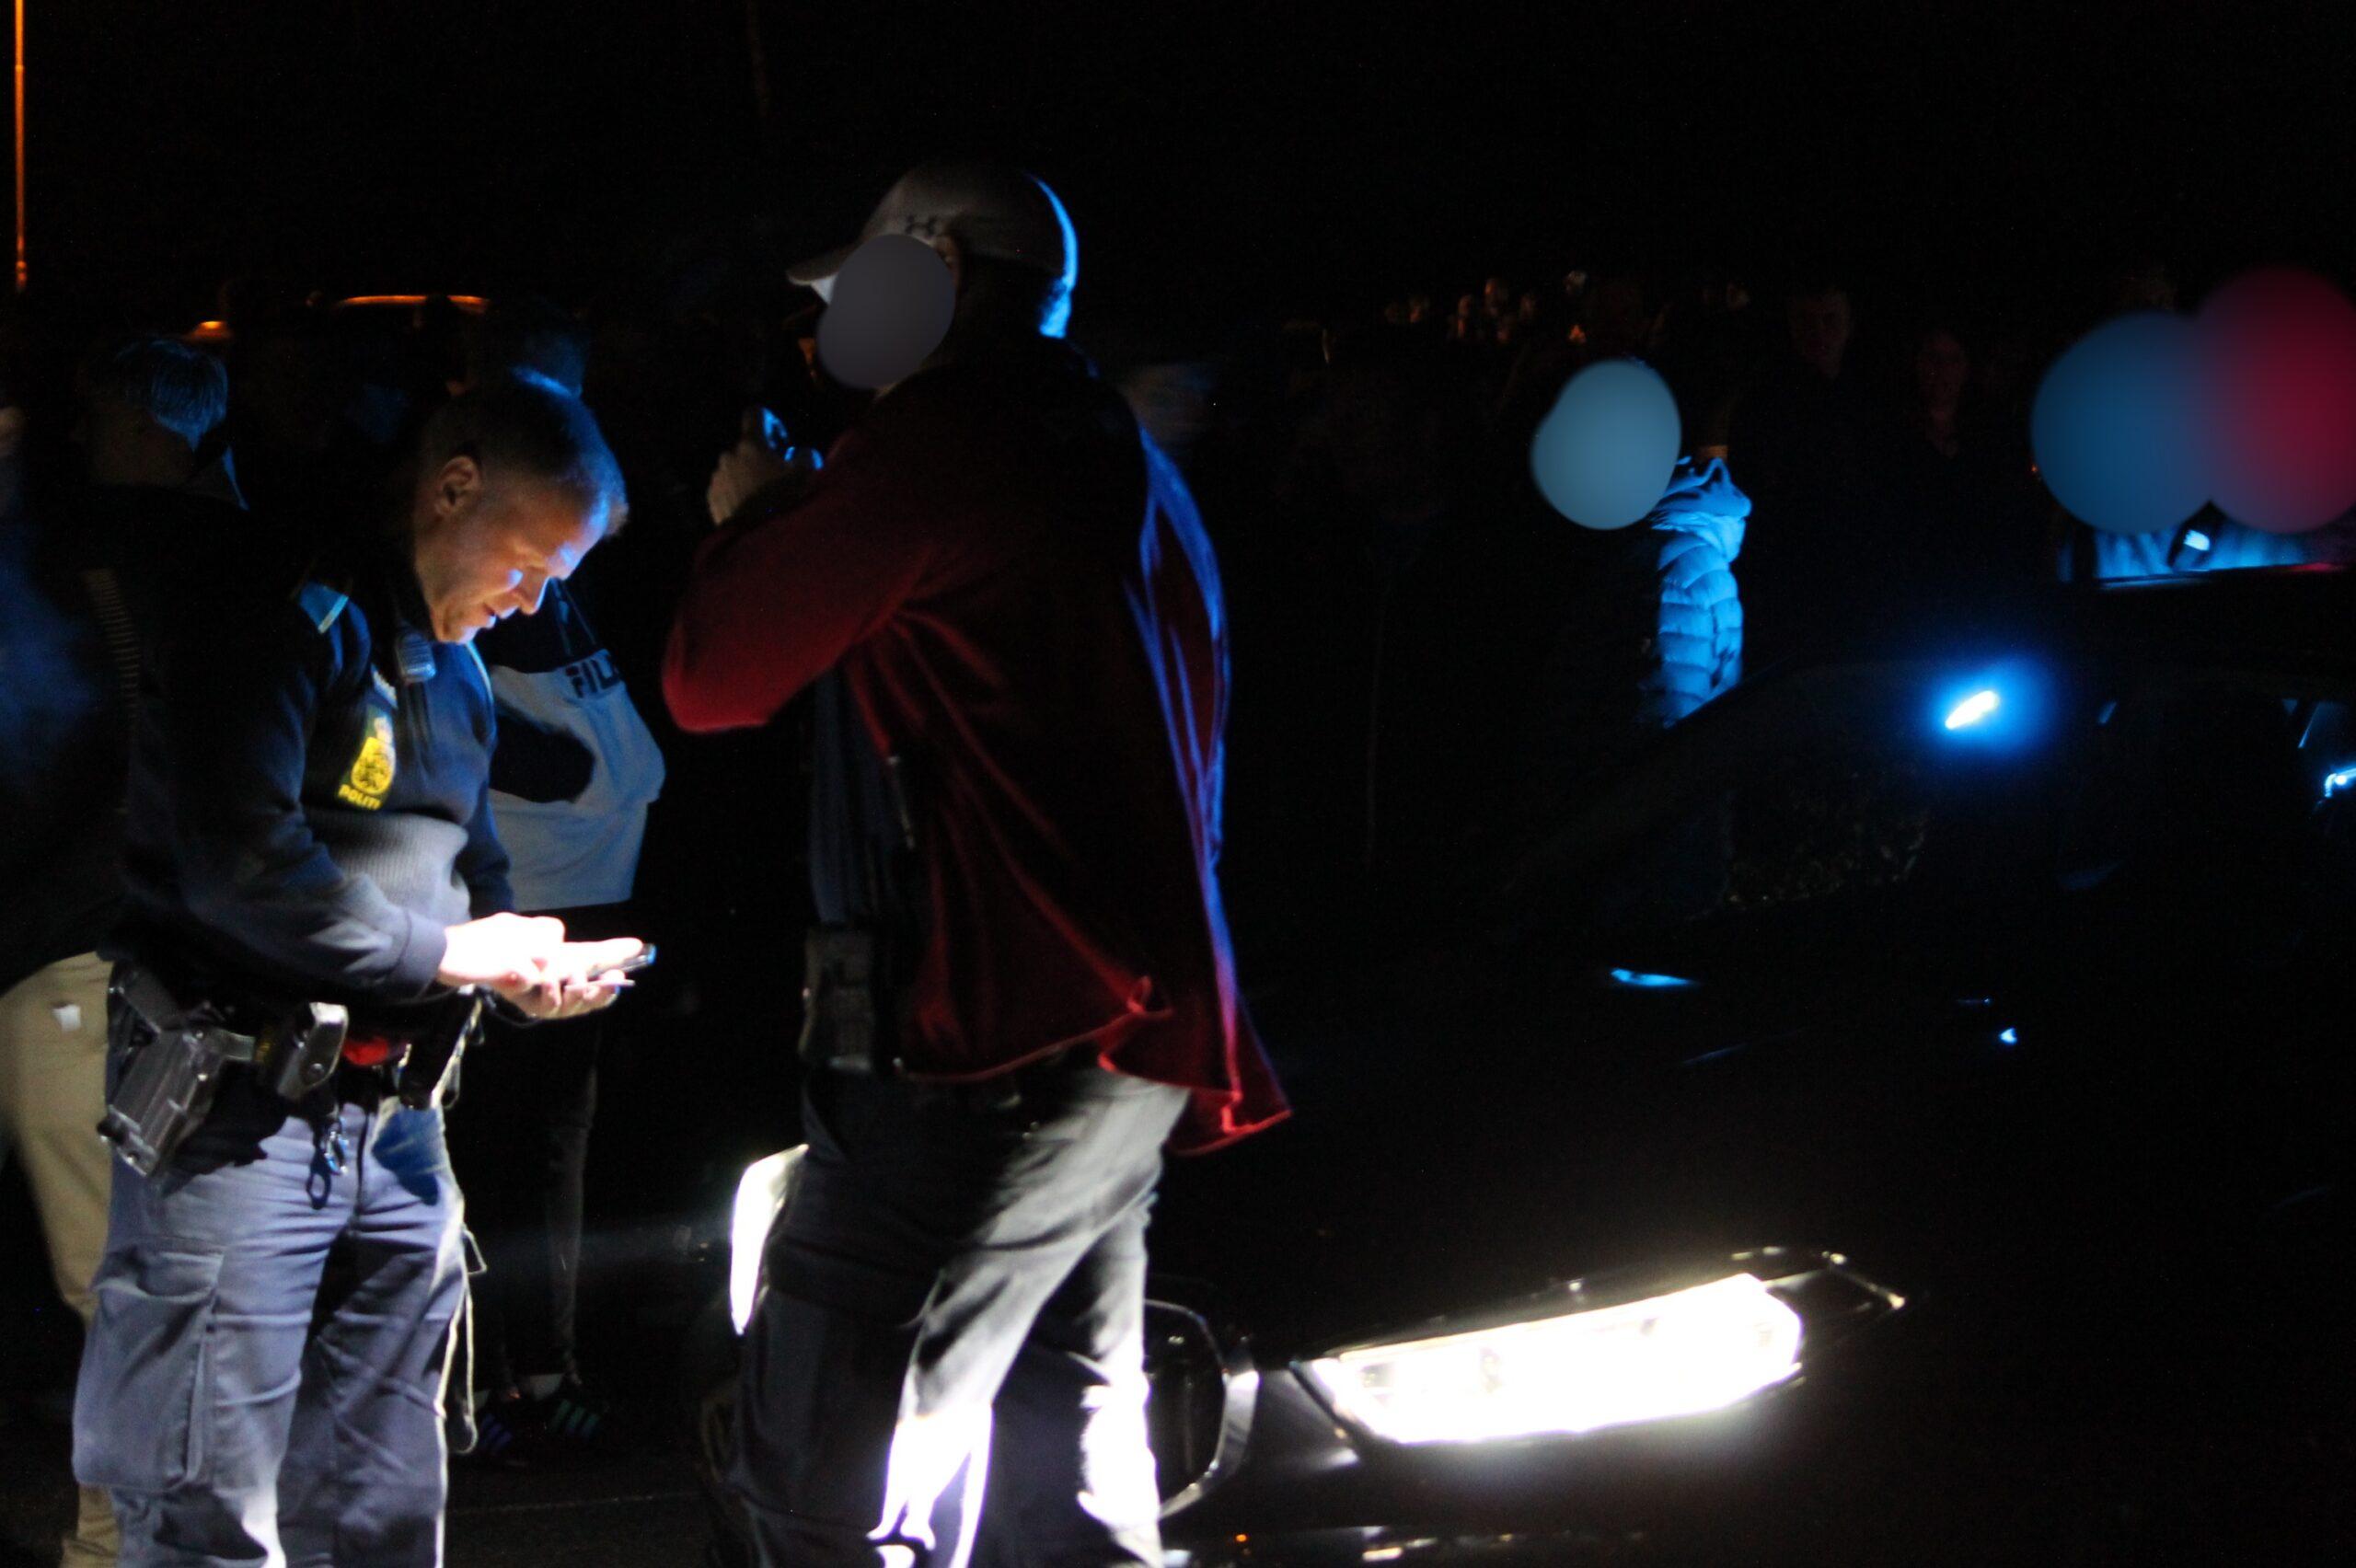 Politiet lukker biltræf i Aarhus